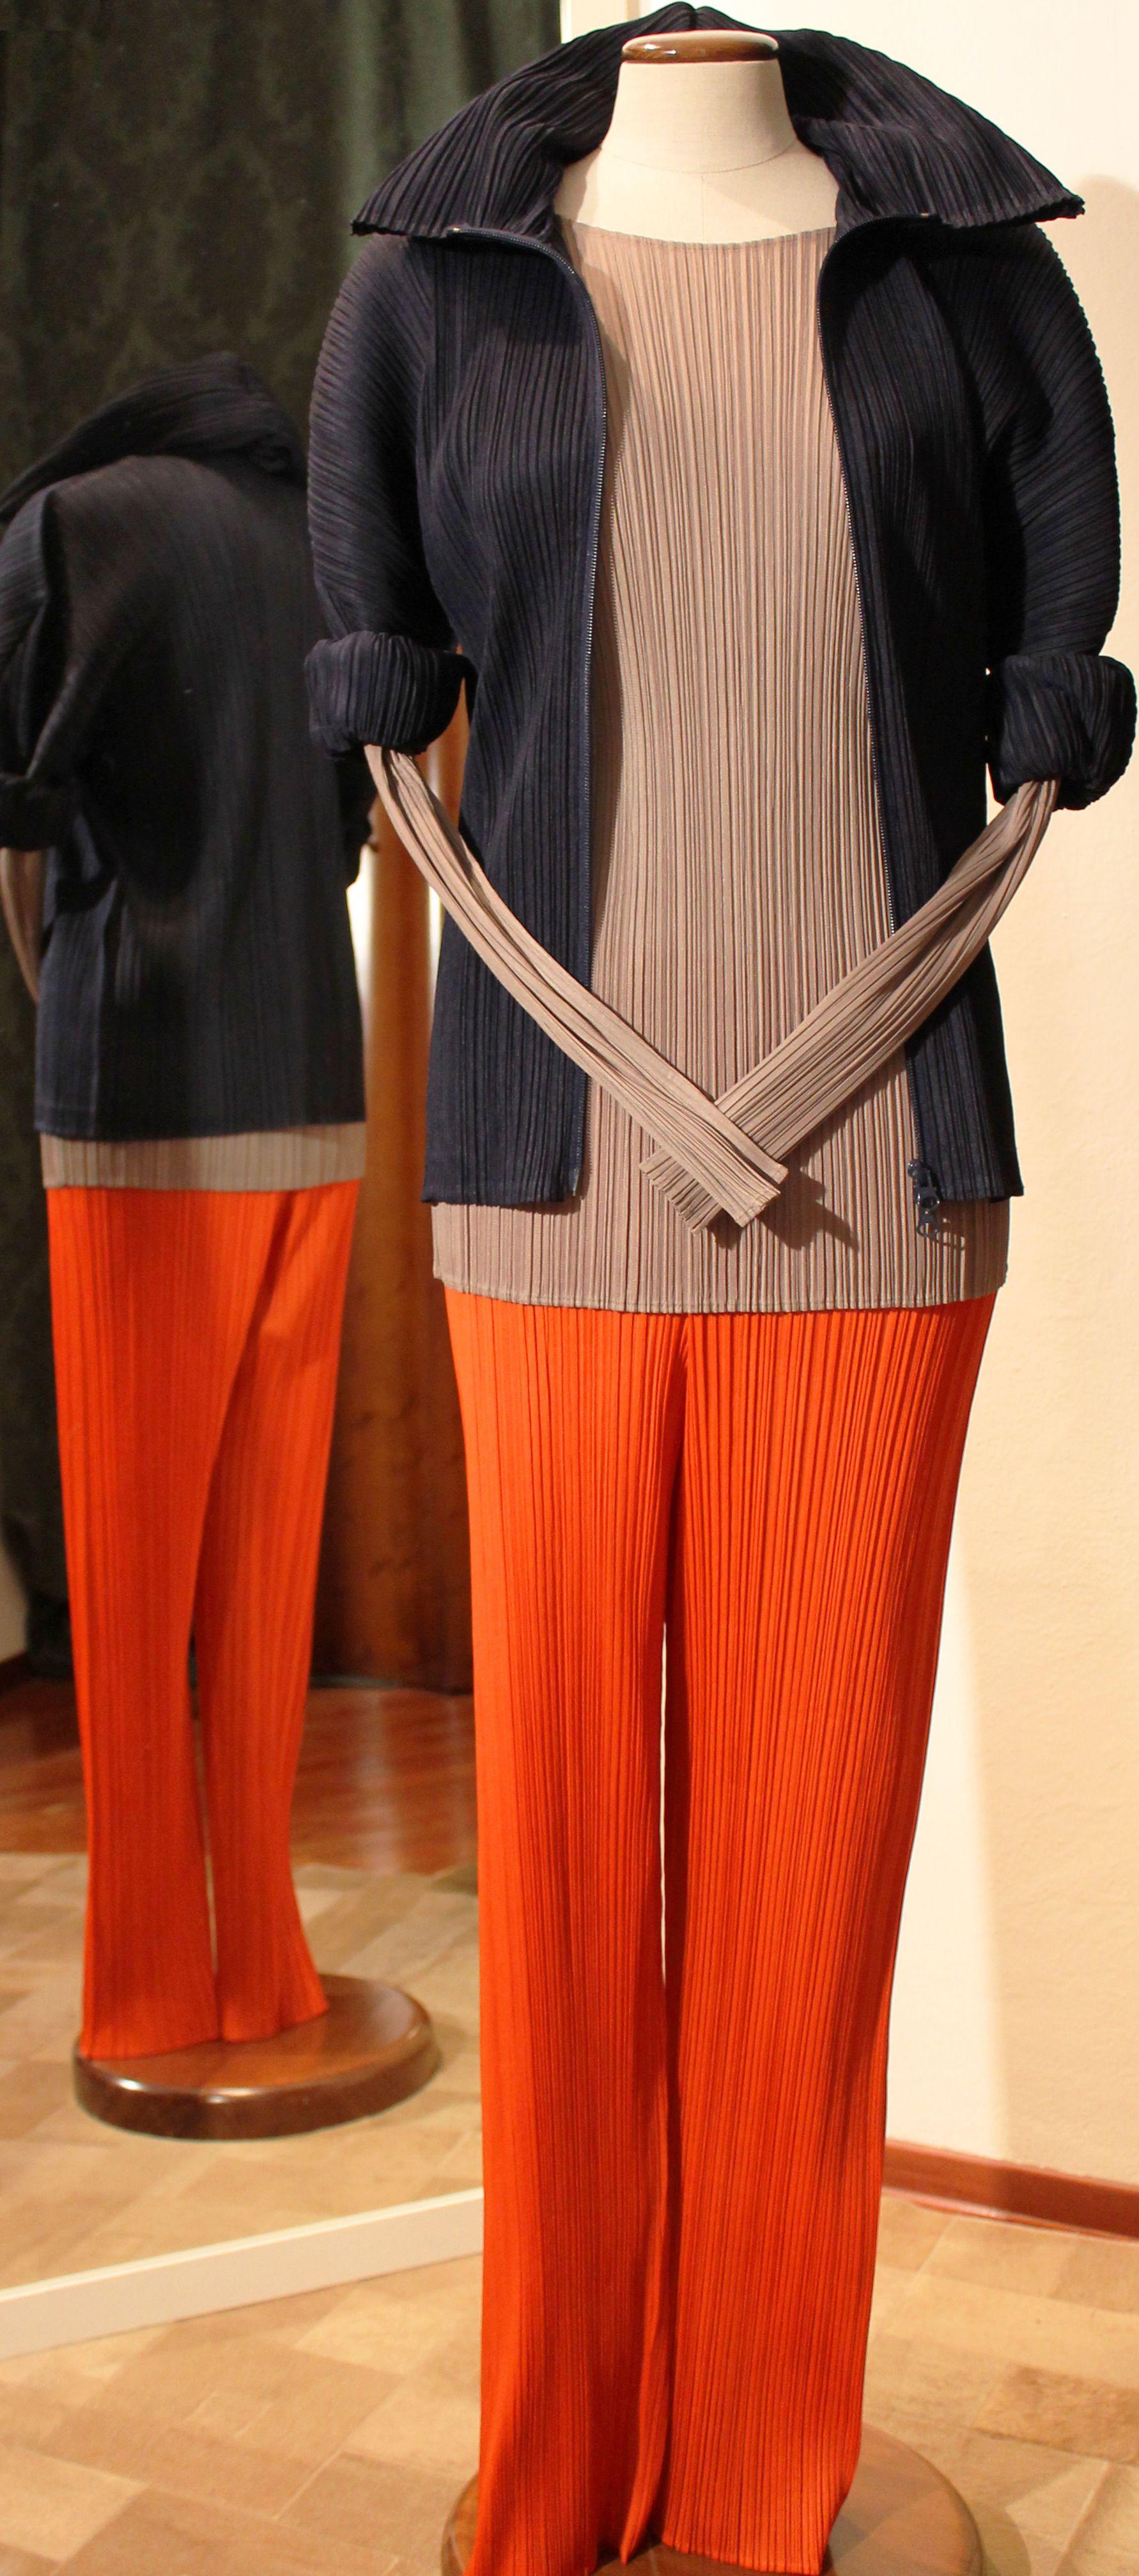 Giacca con zip e cappuccio navy, blusa nocciola e pantaloni arancio PLEATS PLEASE - I.MIYAKE.